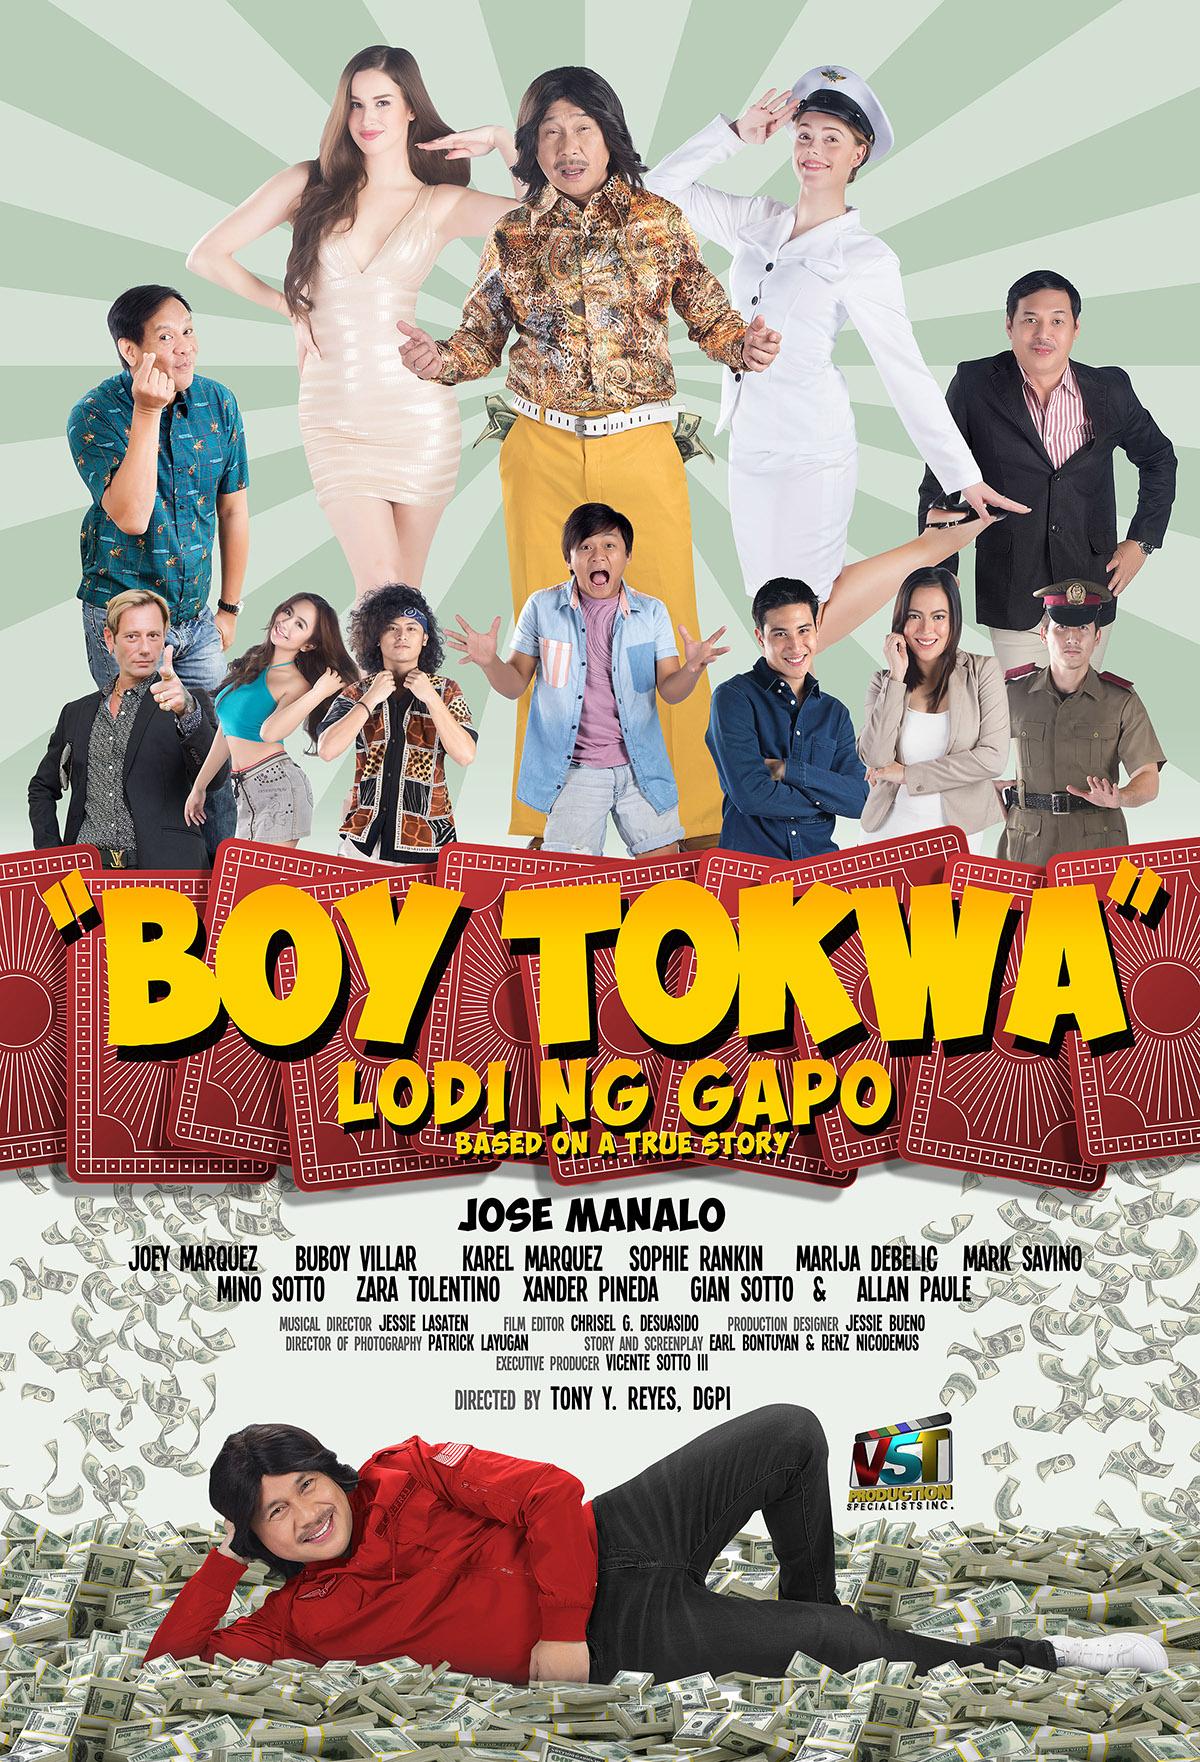 8 Boy Tokwa Lodi ng Gapo